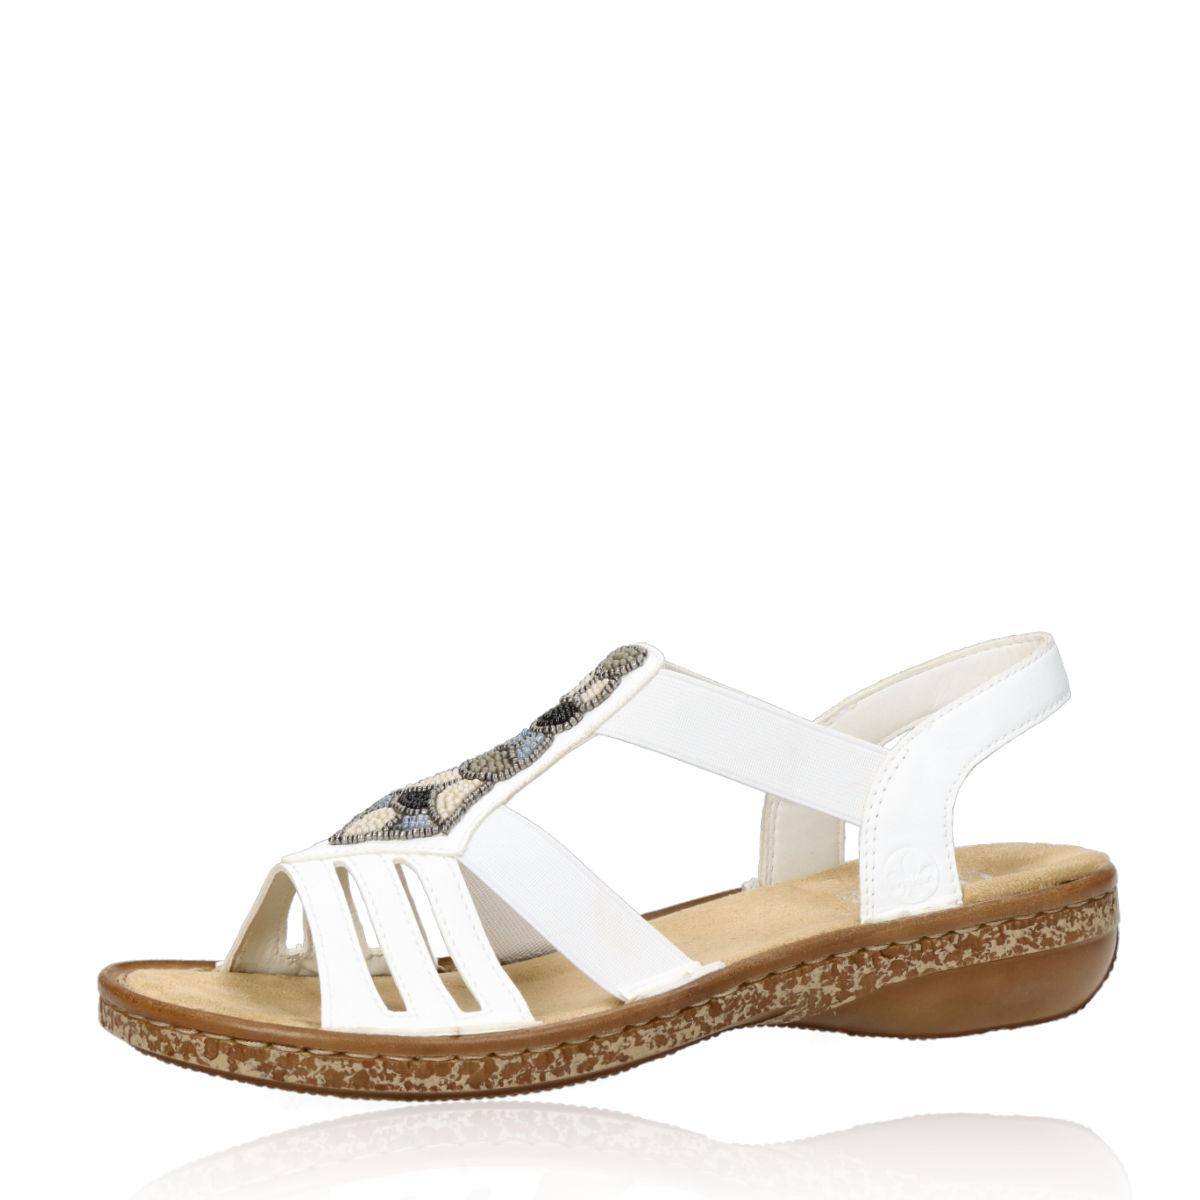 0cb56bf8b8db Rieker dámske elegantné sandále - biele Rieker dámske elegantné sandále -  biele ...